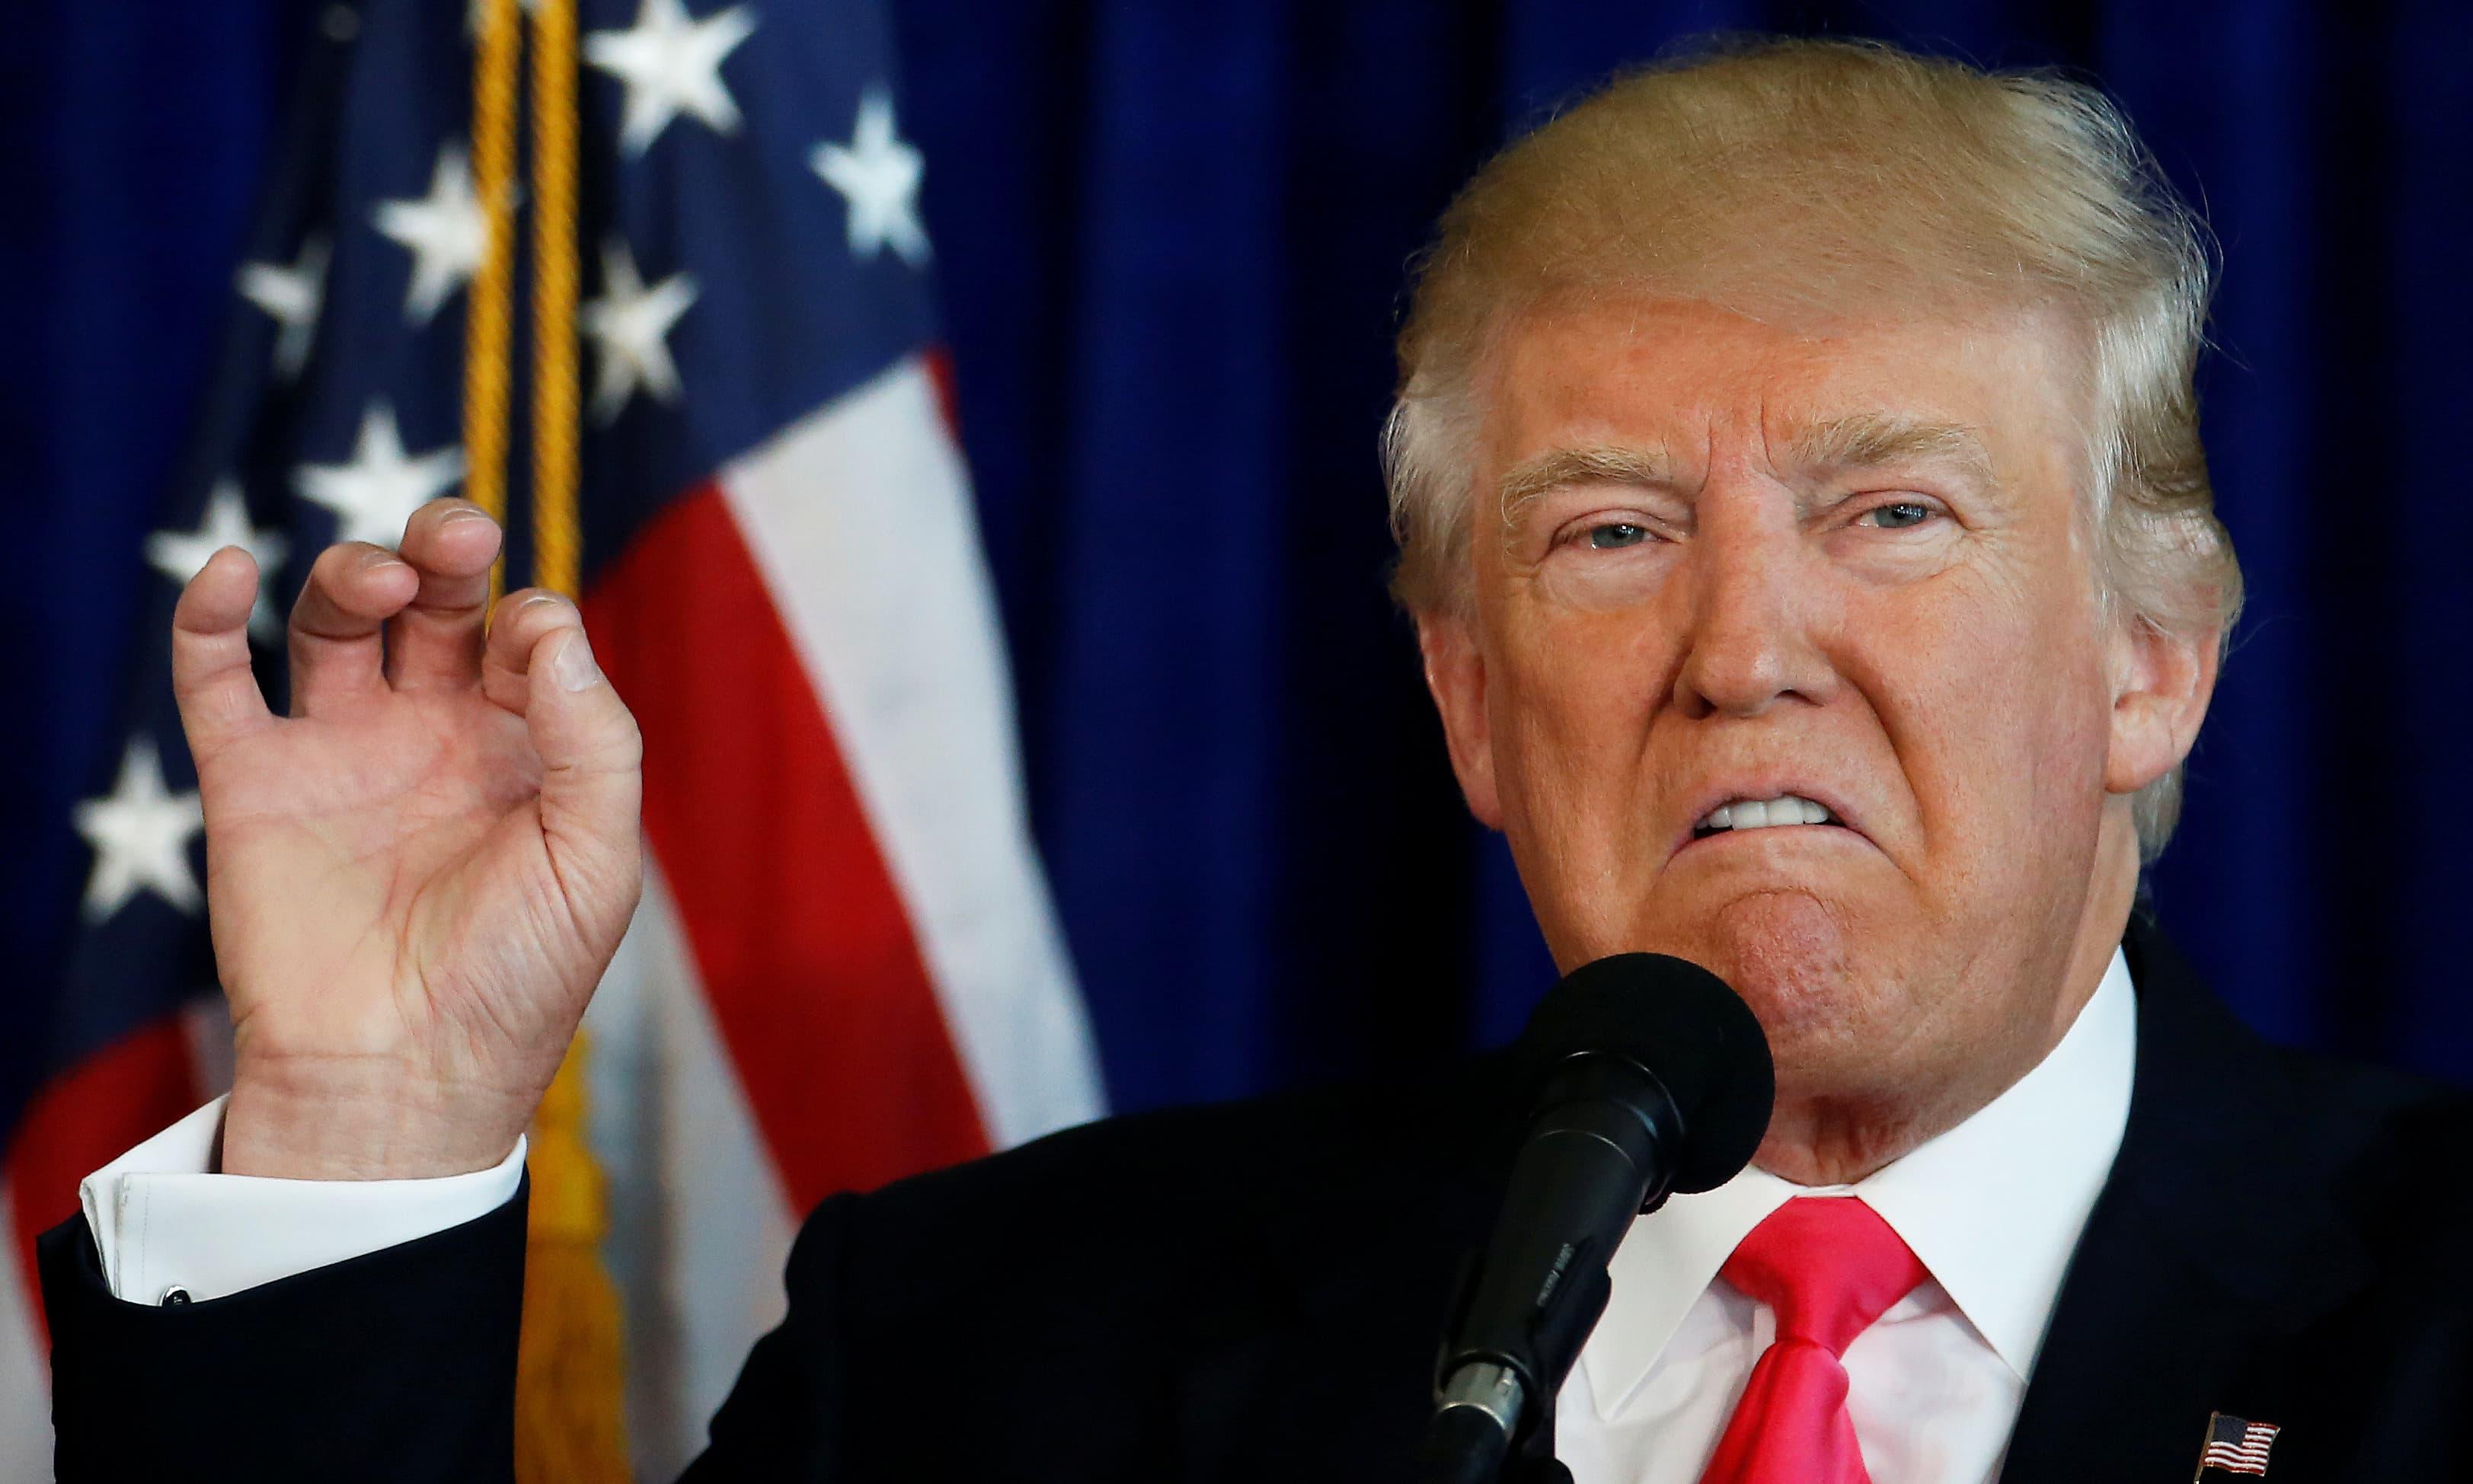 Republican presidential nominee Donald Trump speaks at a campaign event at Trump Doral golf course in Miami, Florida. —Reuters